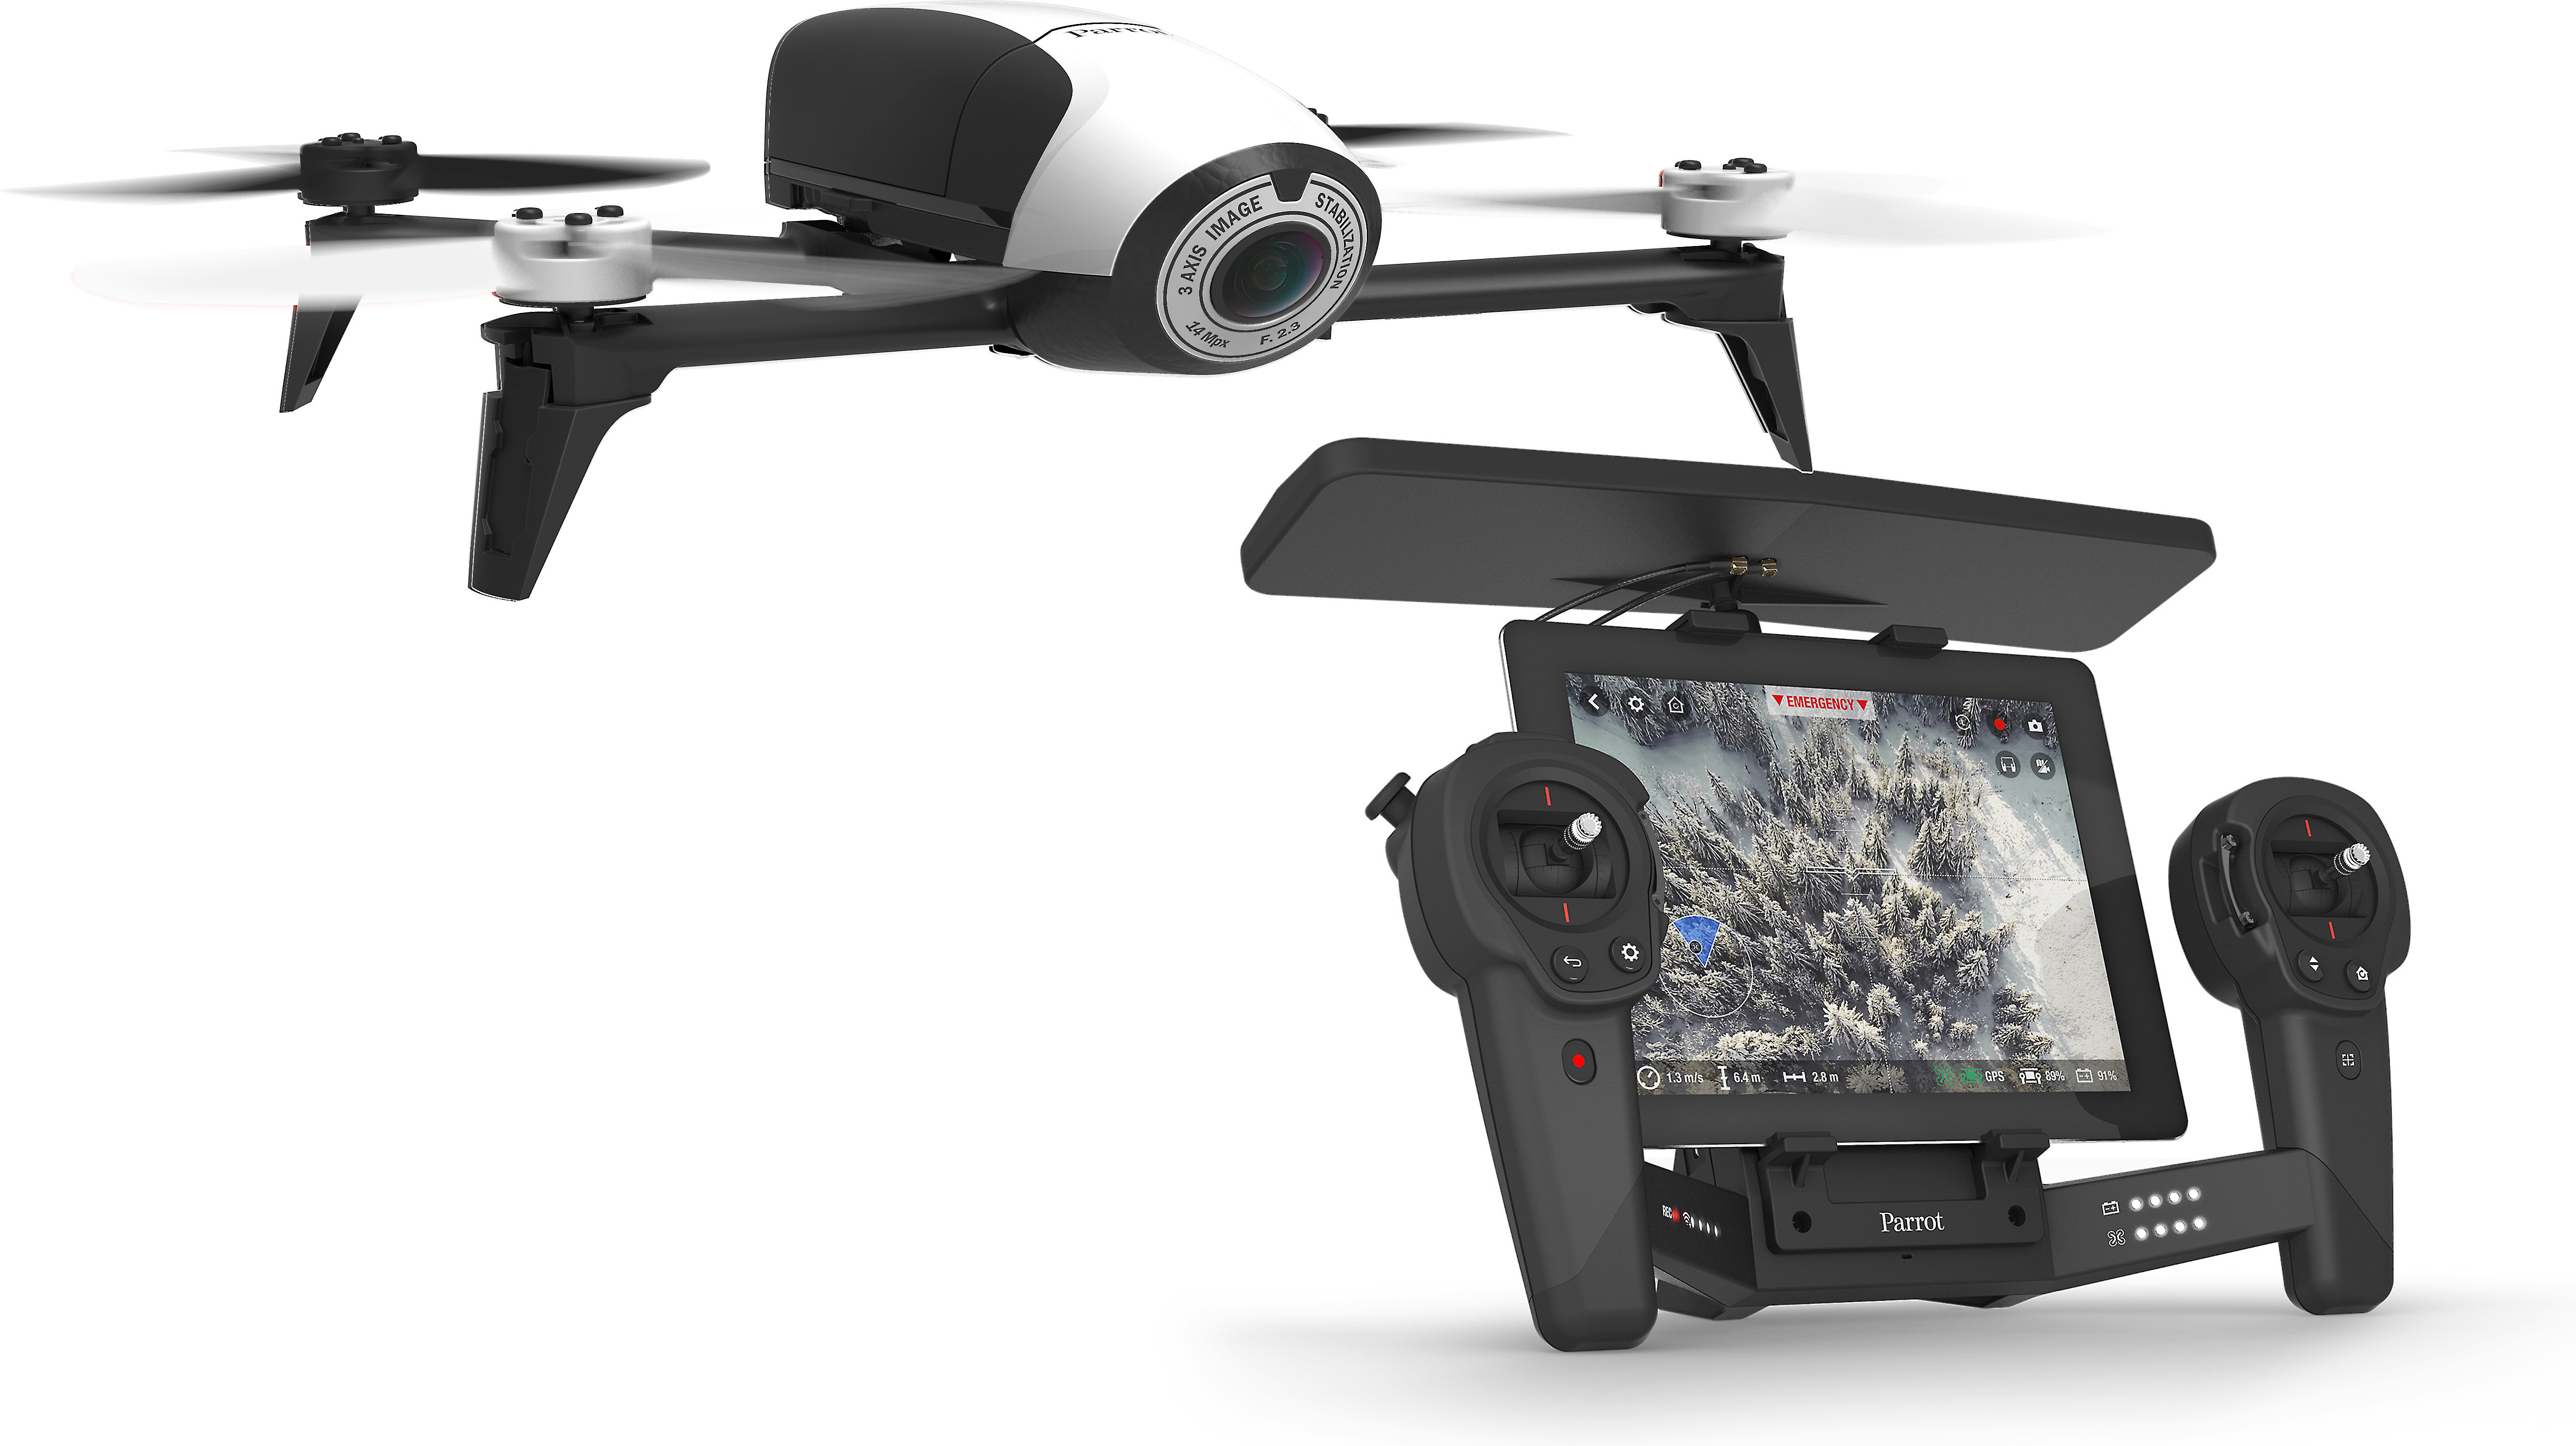 Parrot Bebop 2 Drone and Skycontroller Black Bundle (White/Black)